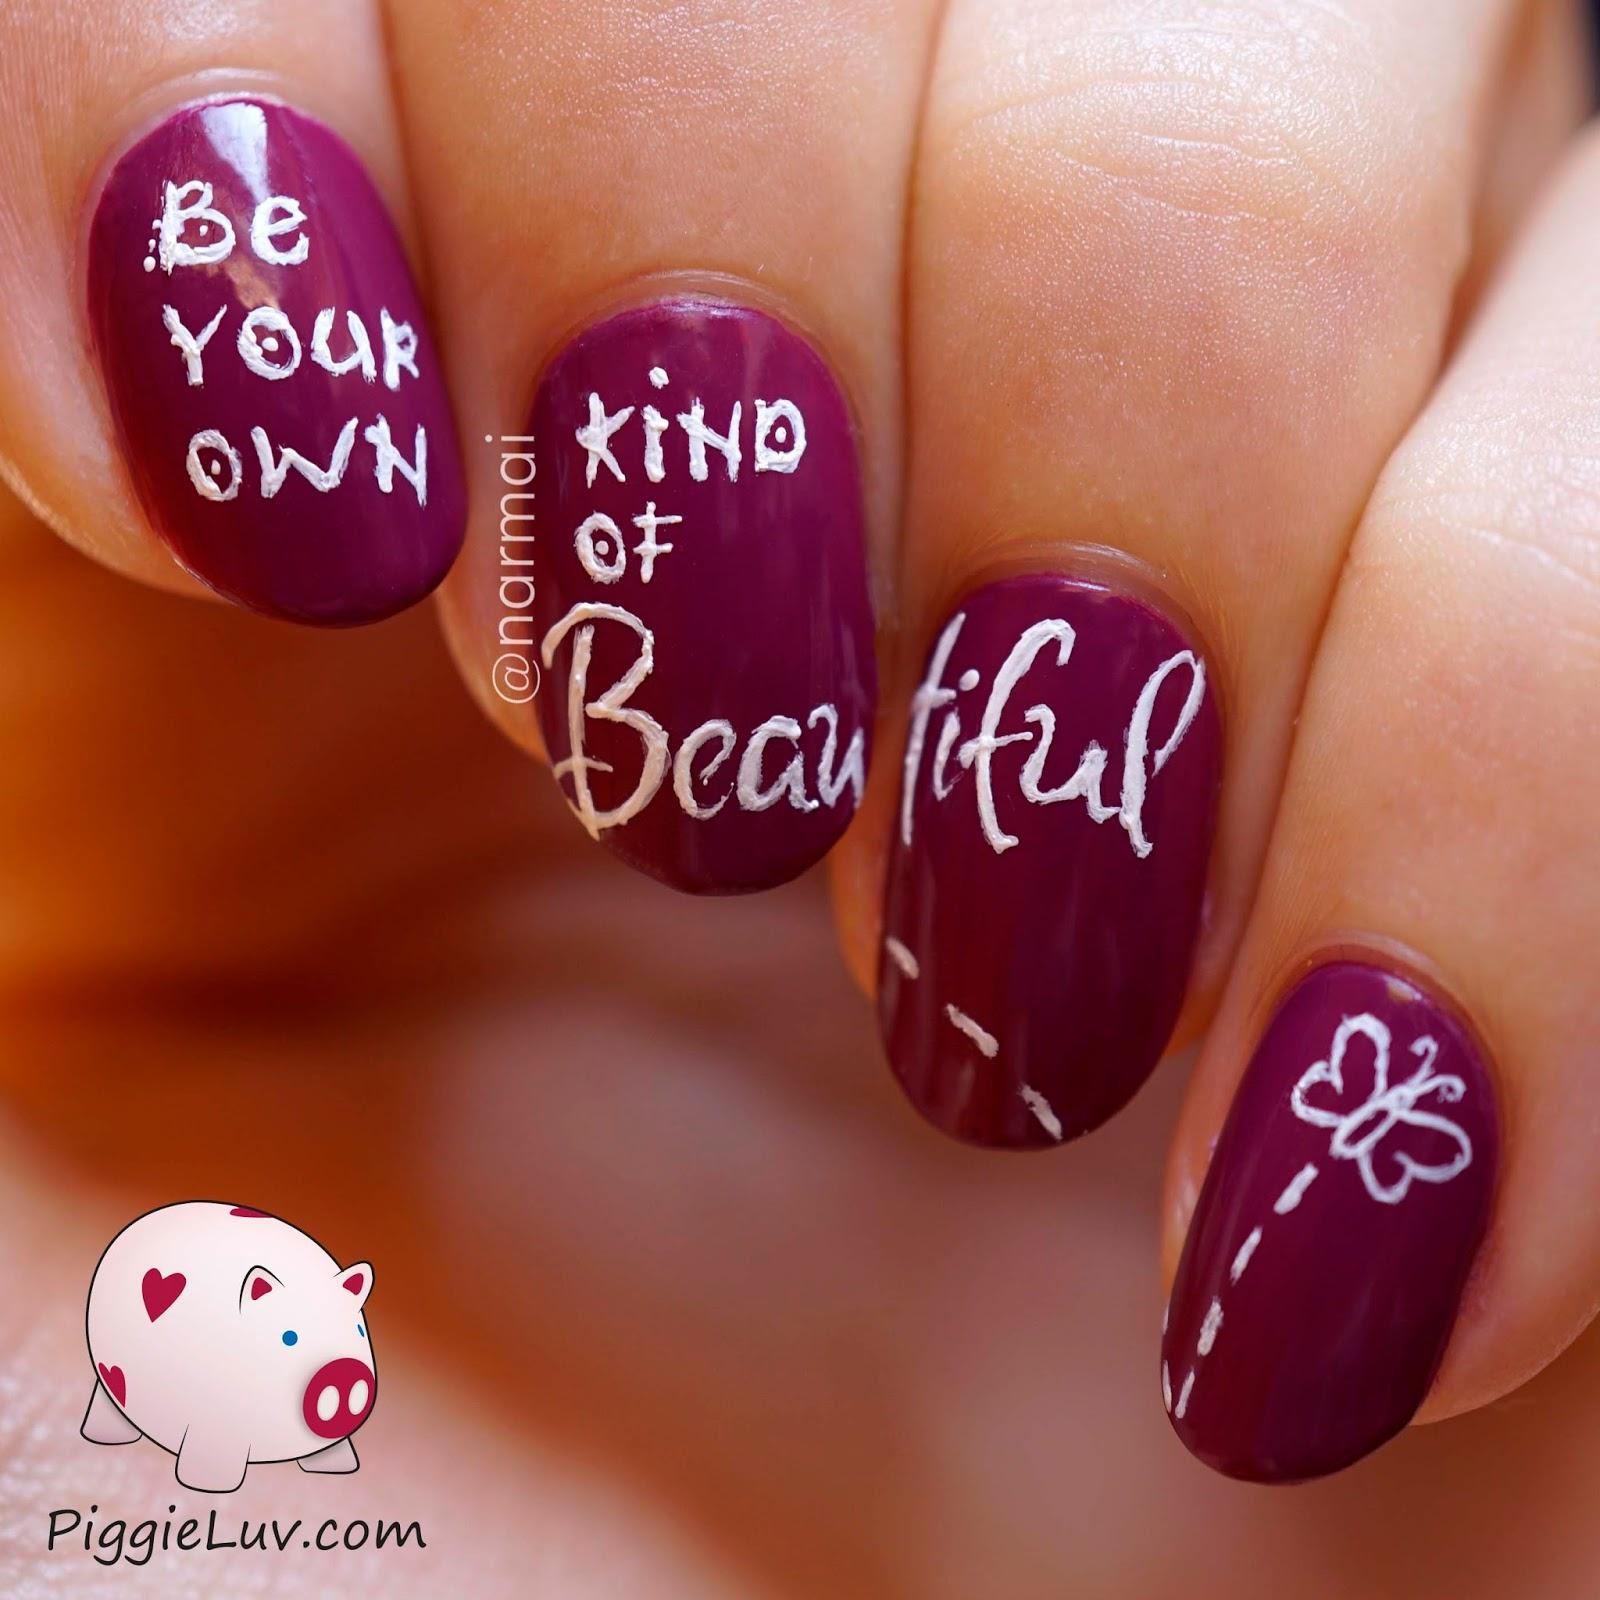 Image result for nail polish nails quotes